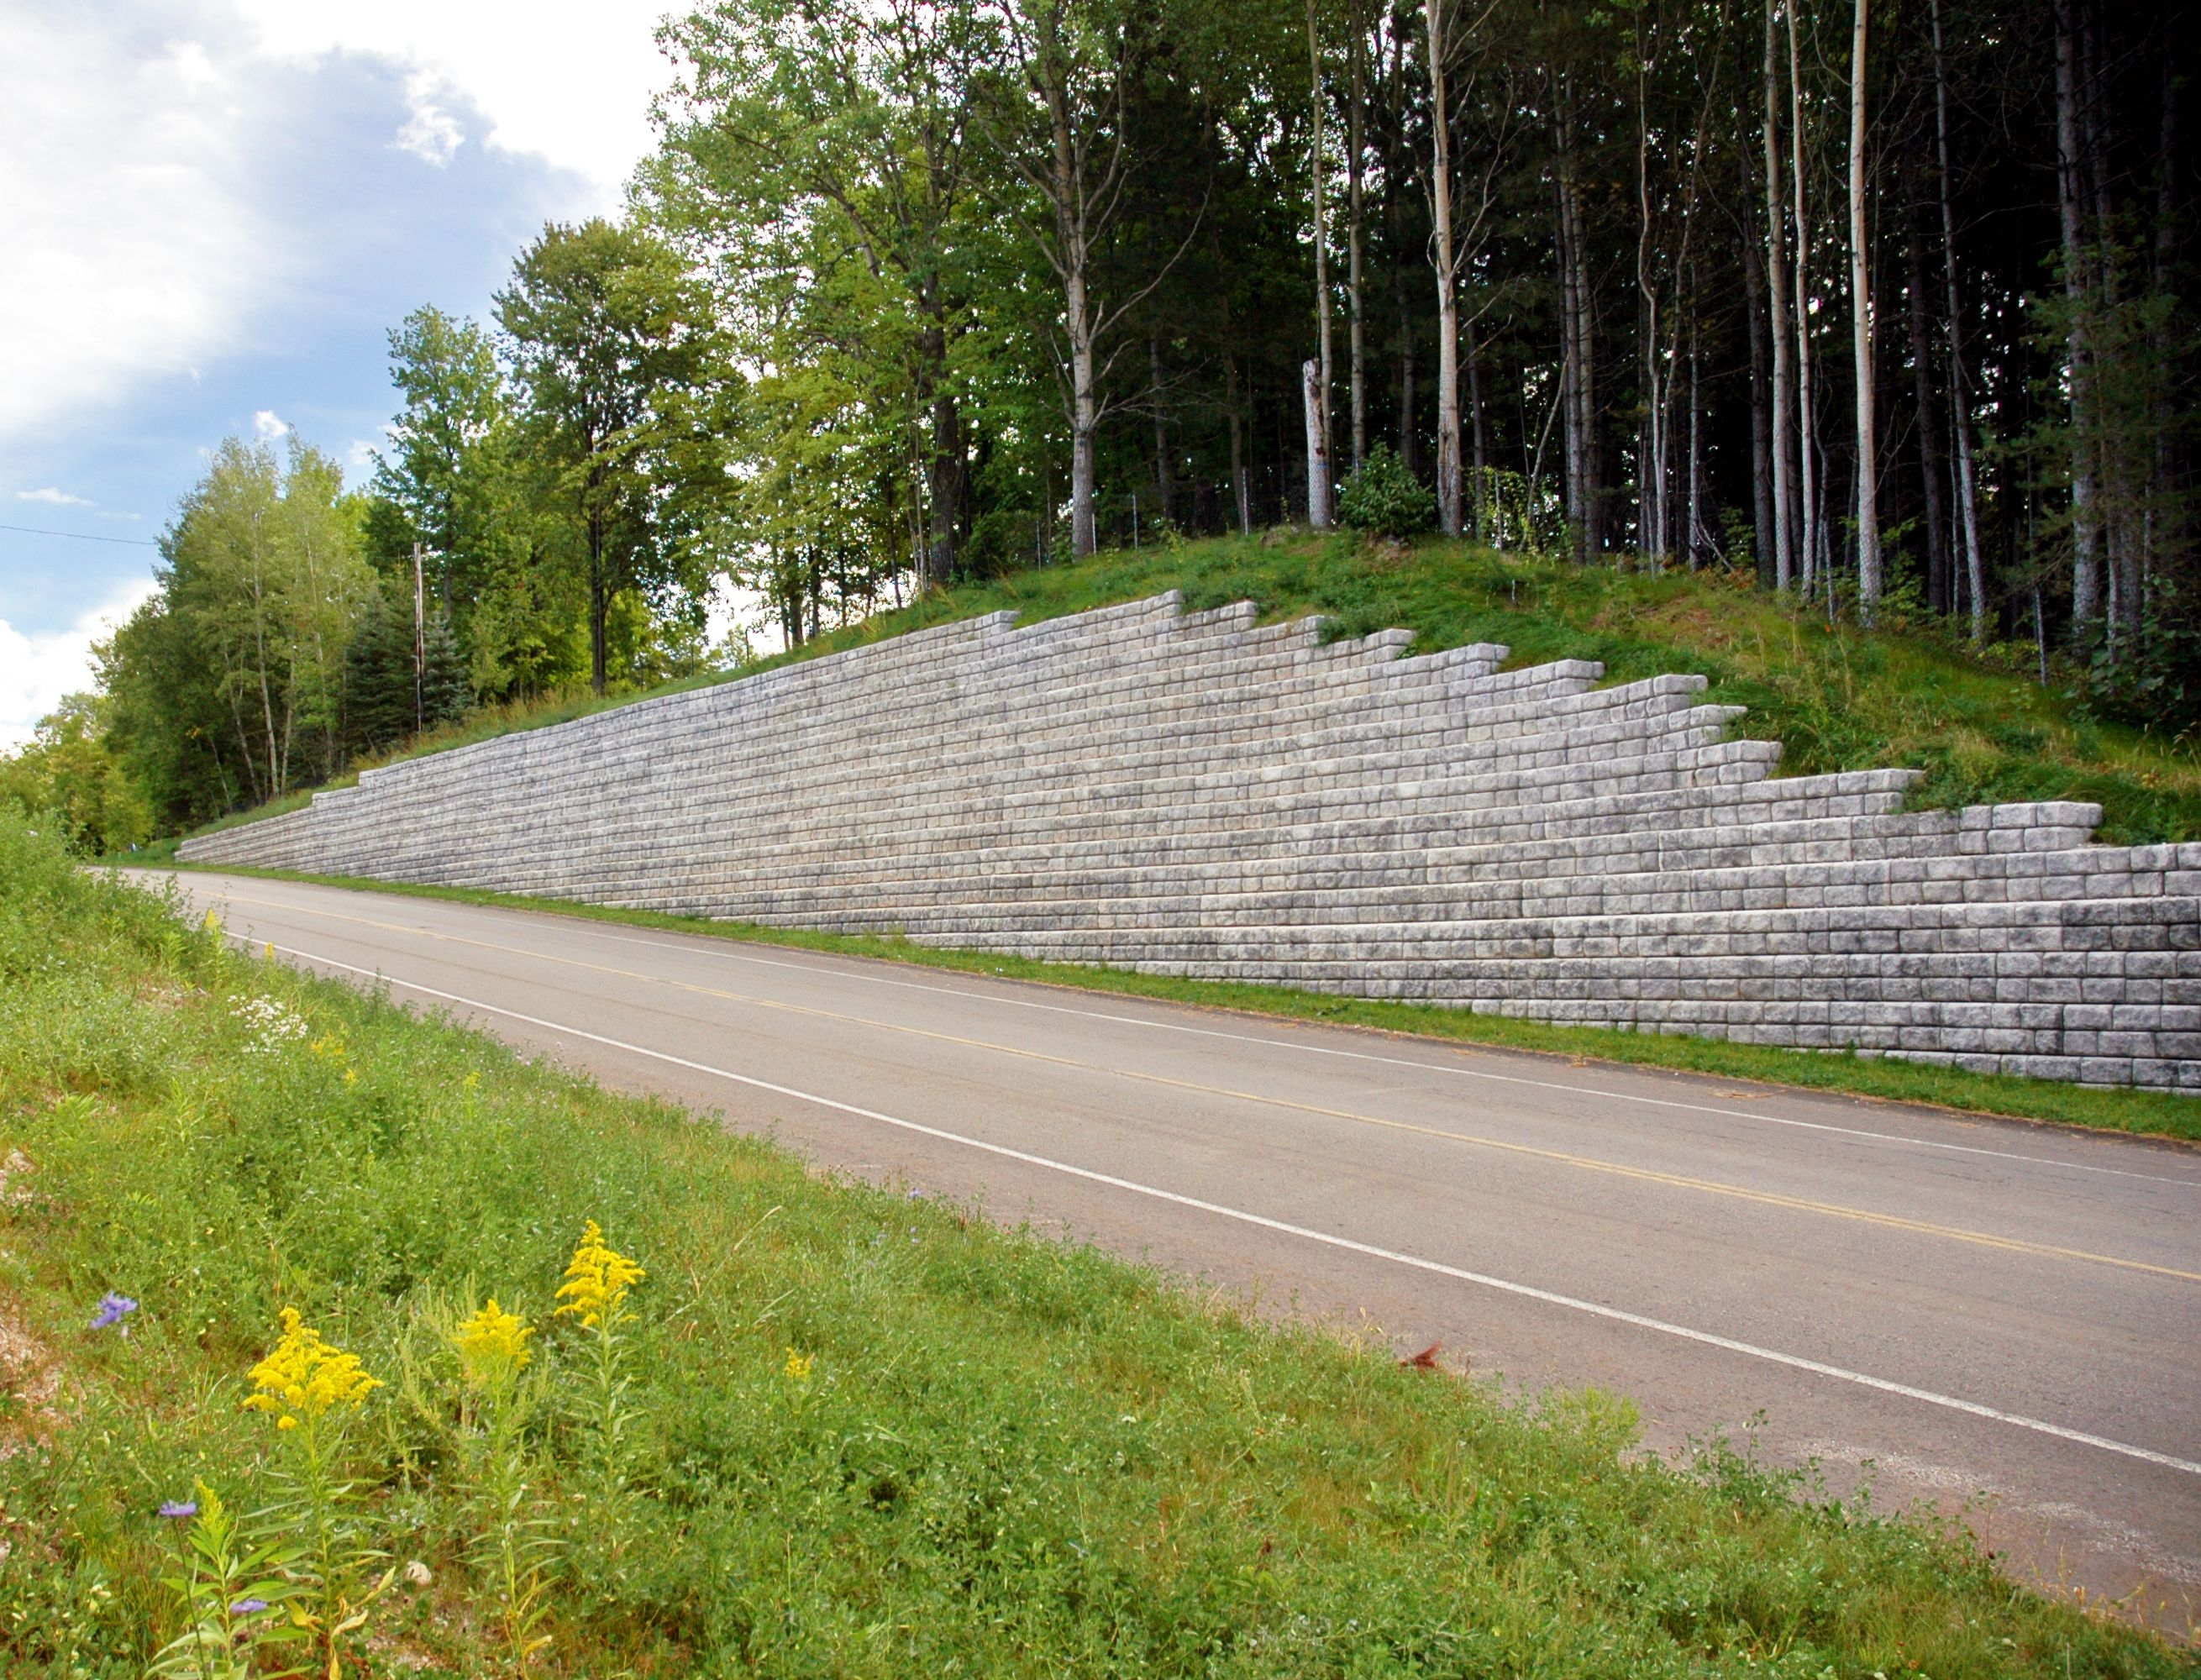 Cobblestone retaining wall along roadway